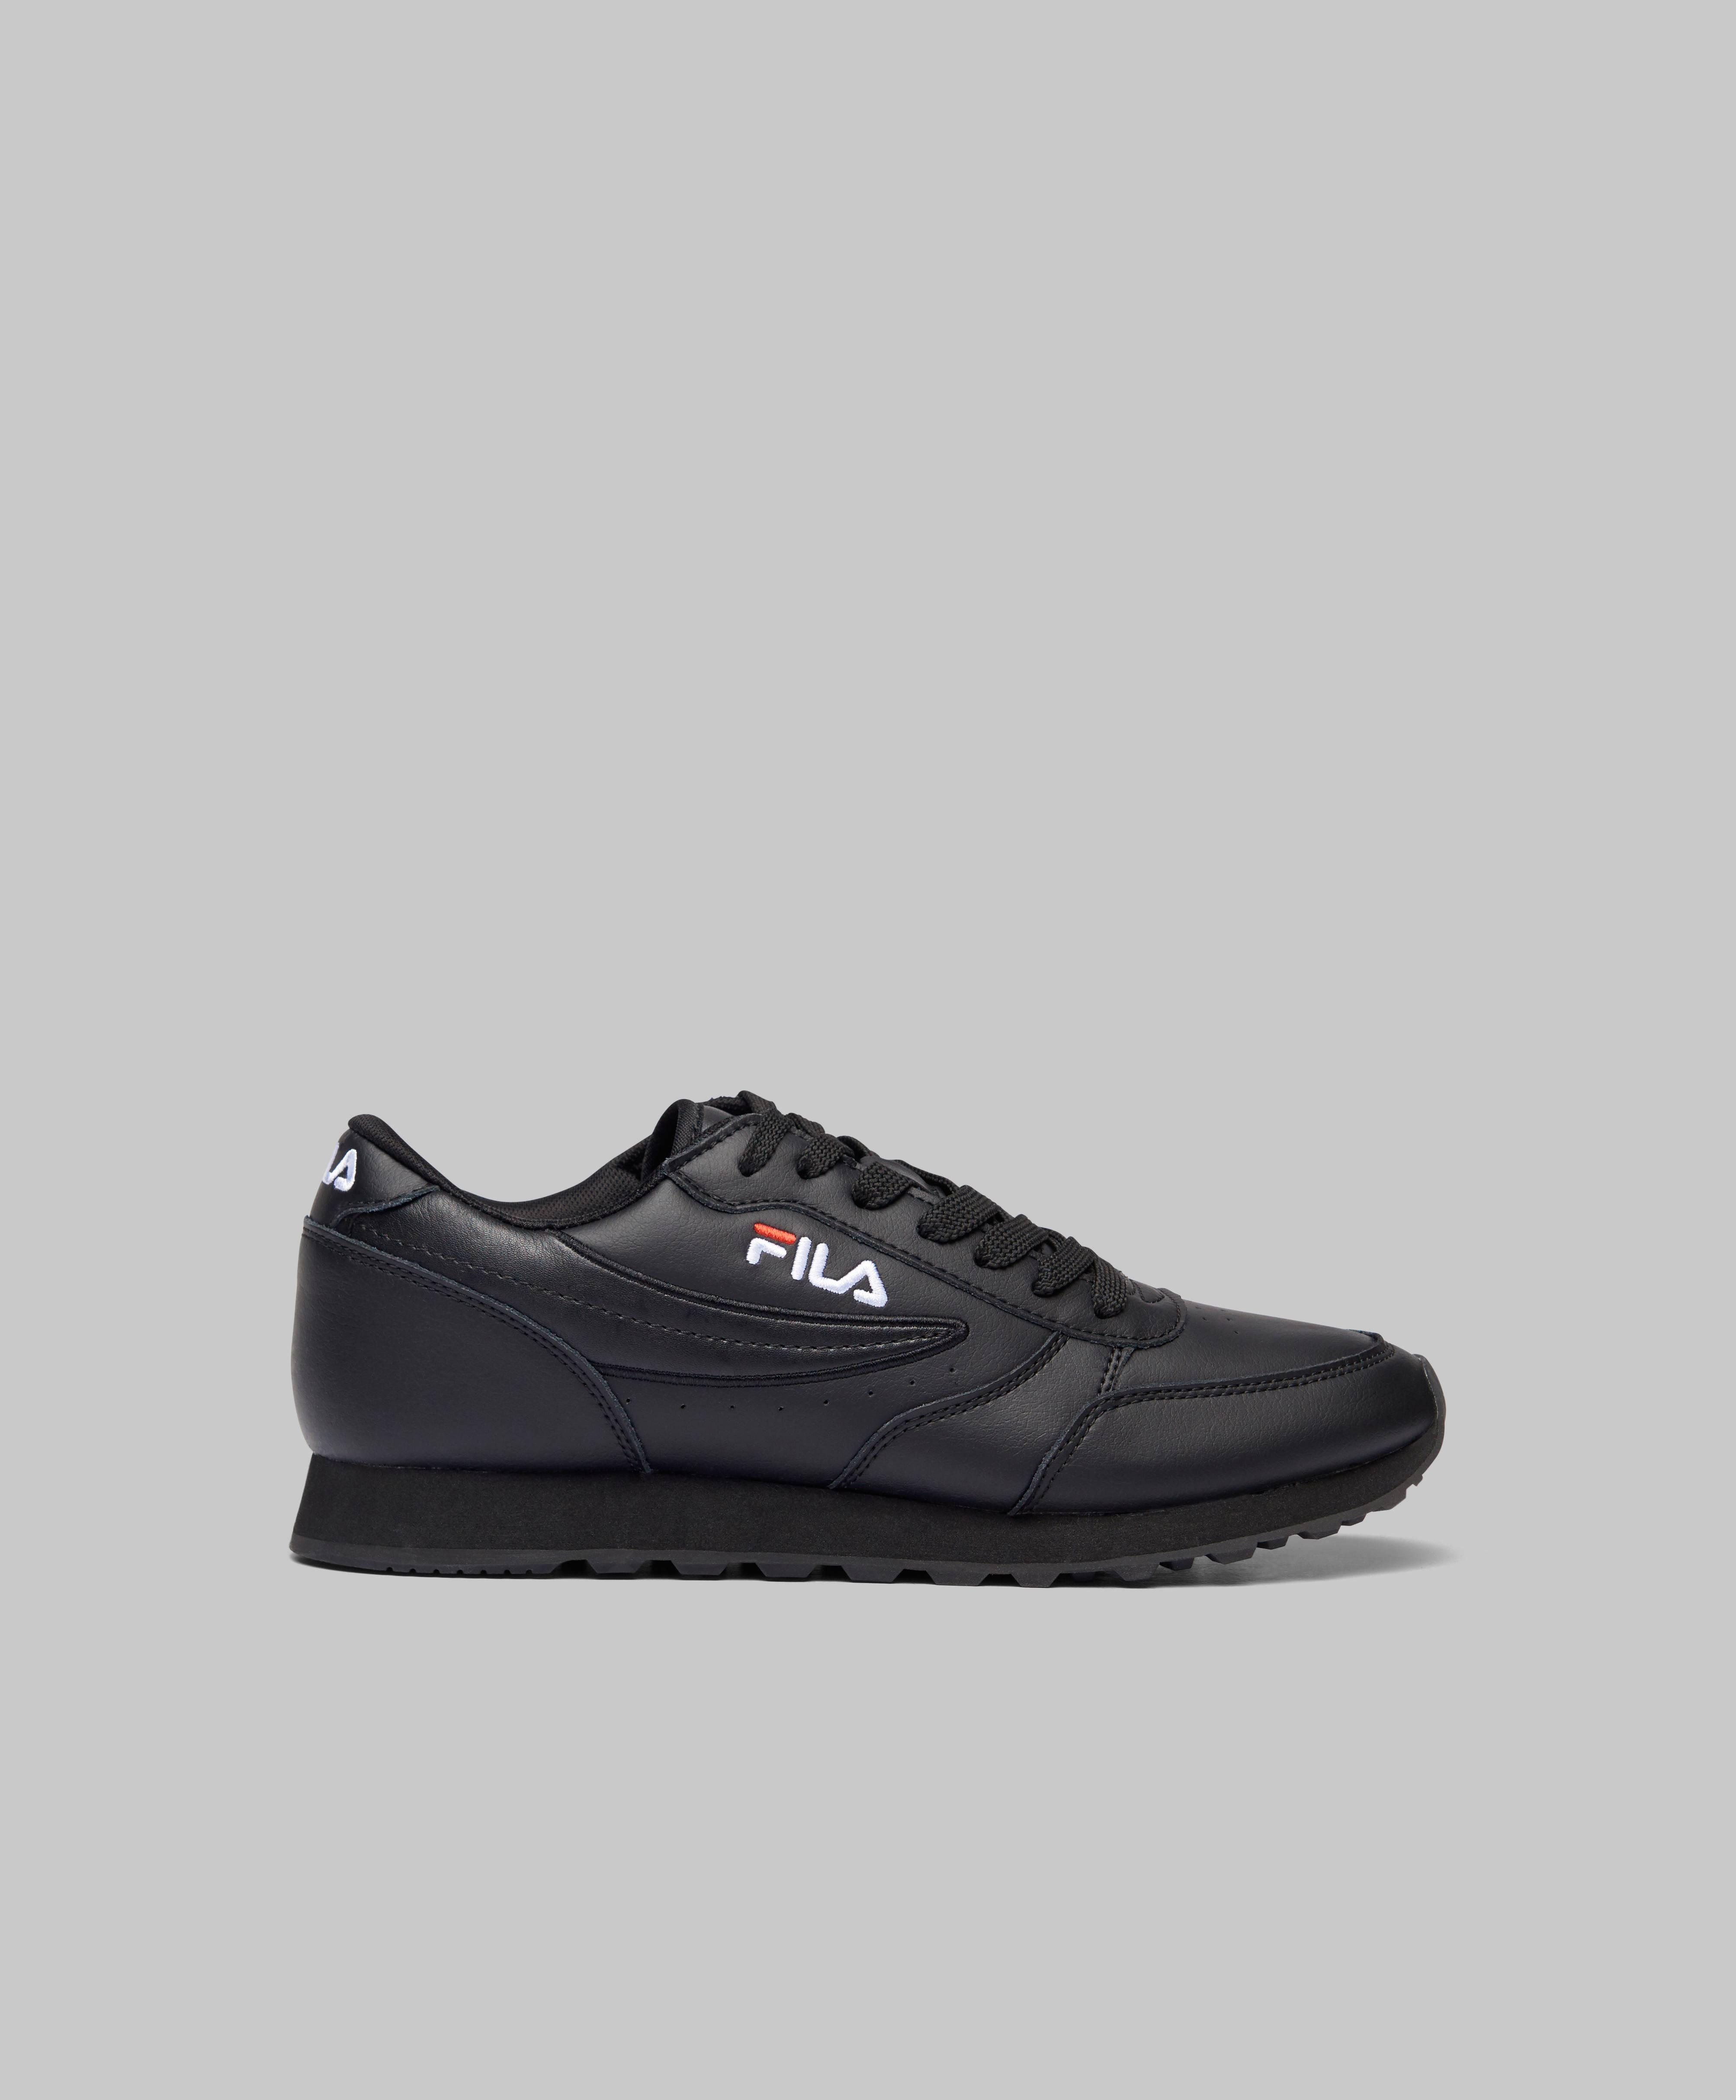 FILA Sneakers Orbit Jogger Low Svart Sko Stayhard.no